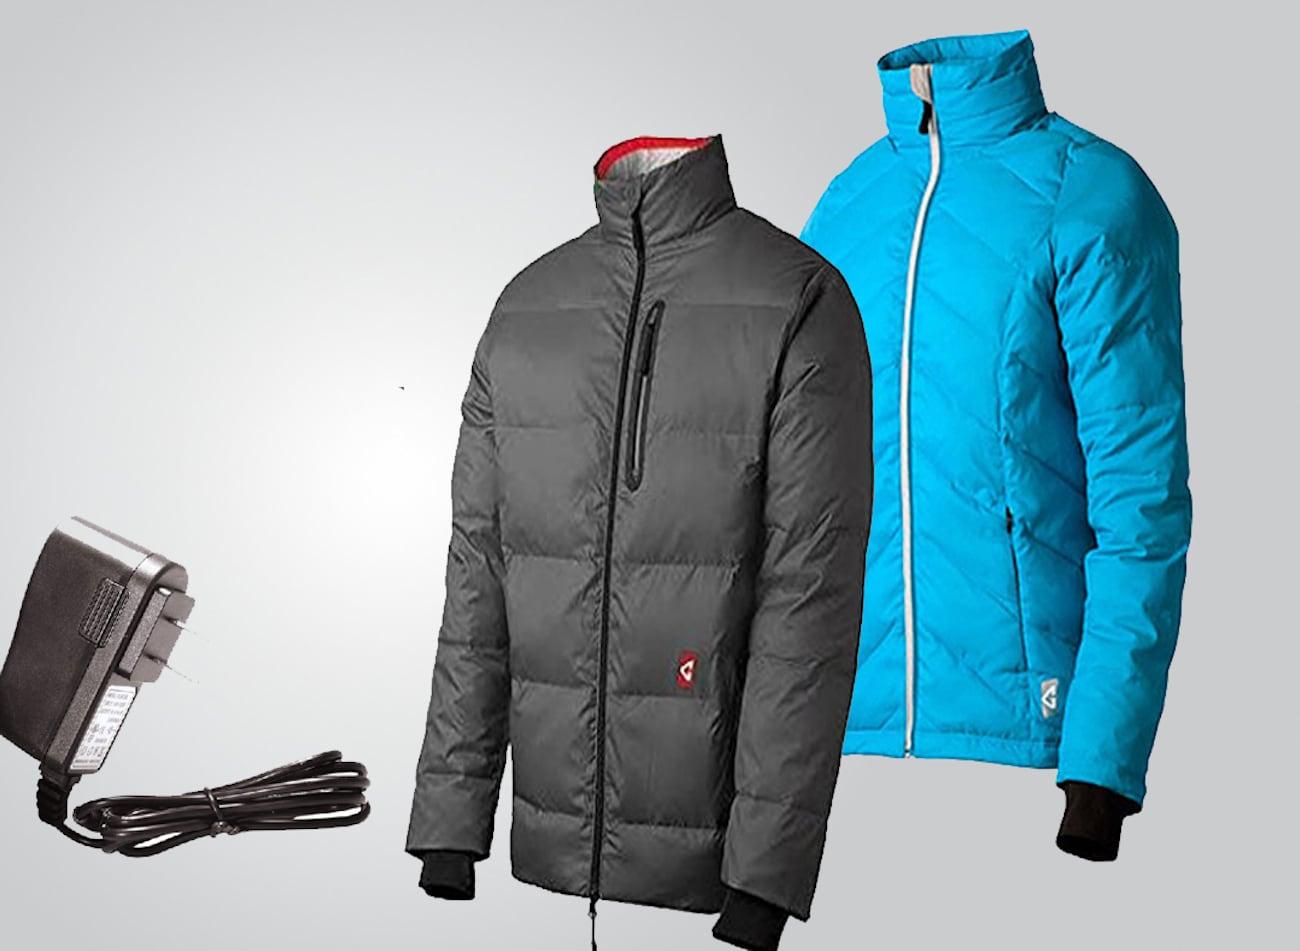 Smart Jacket Battery Powered Heated Jacket